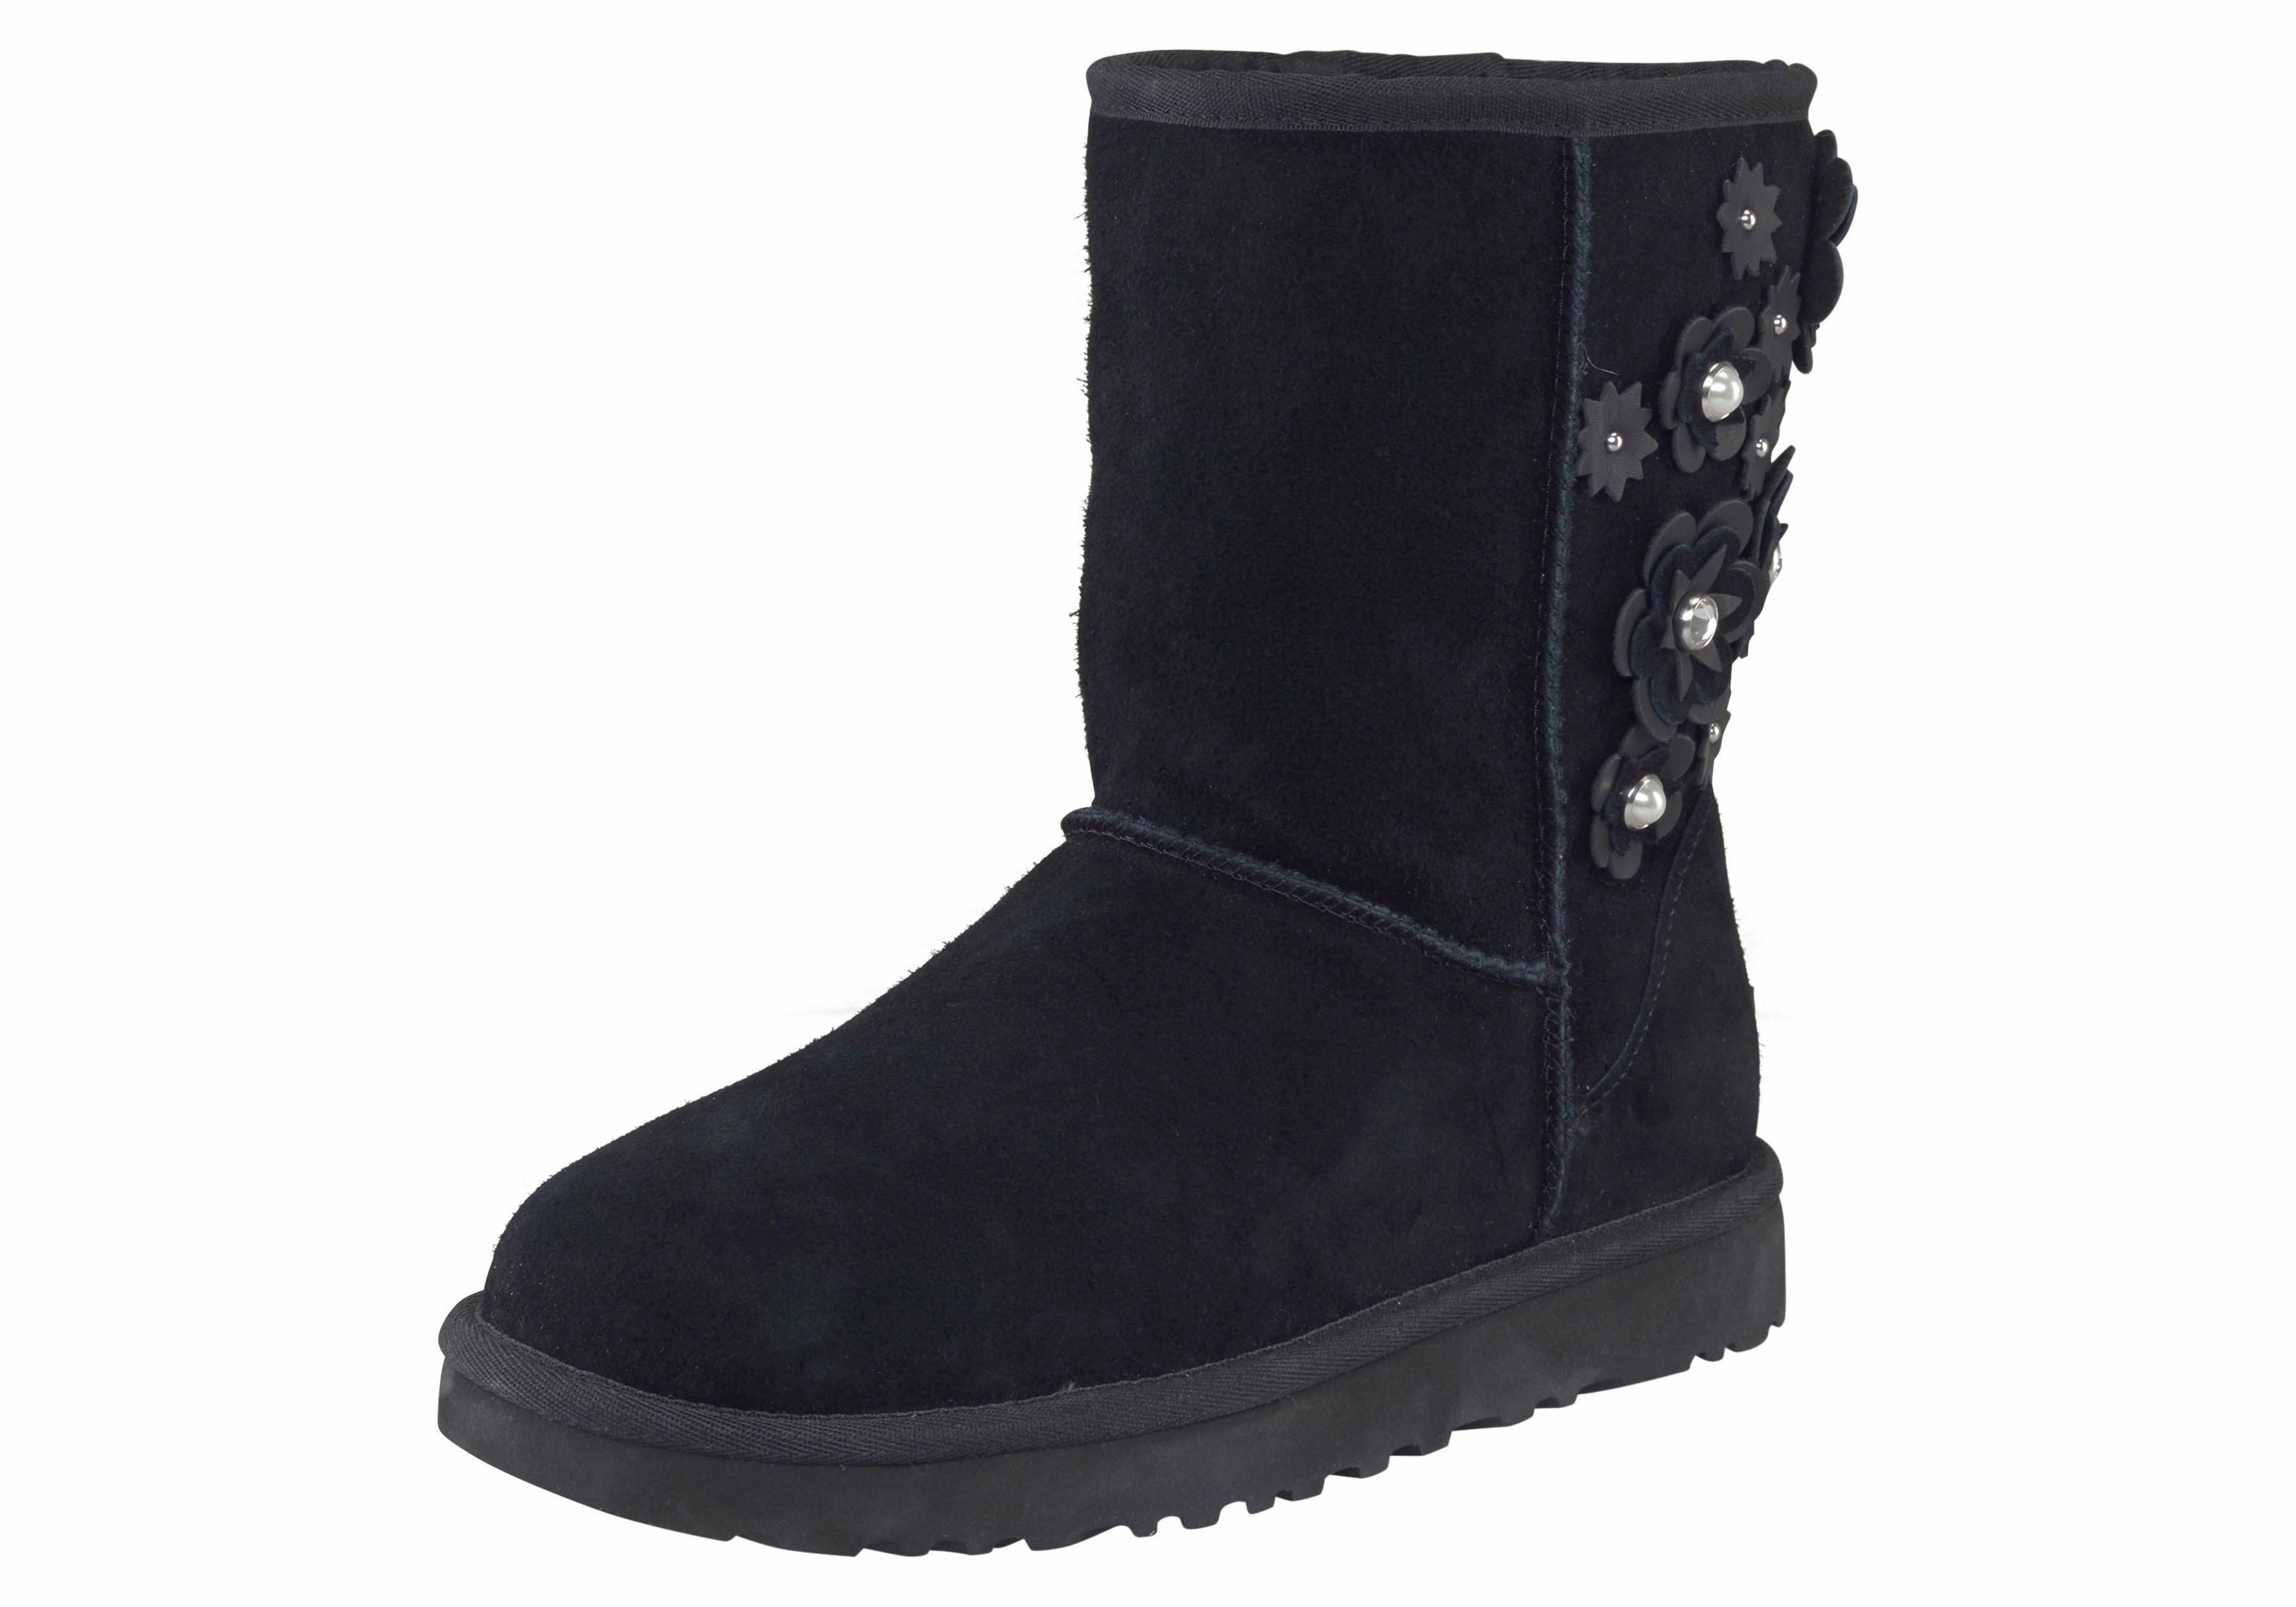 UGG »Classic Short Petal« Winterboots mit tollen Blüten-Applikationen | Schuhe > Boots > Boots | Schwarz | UGG